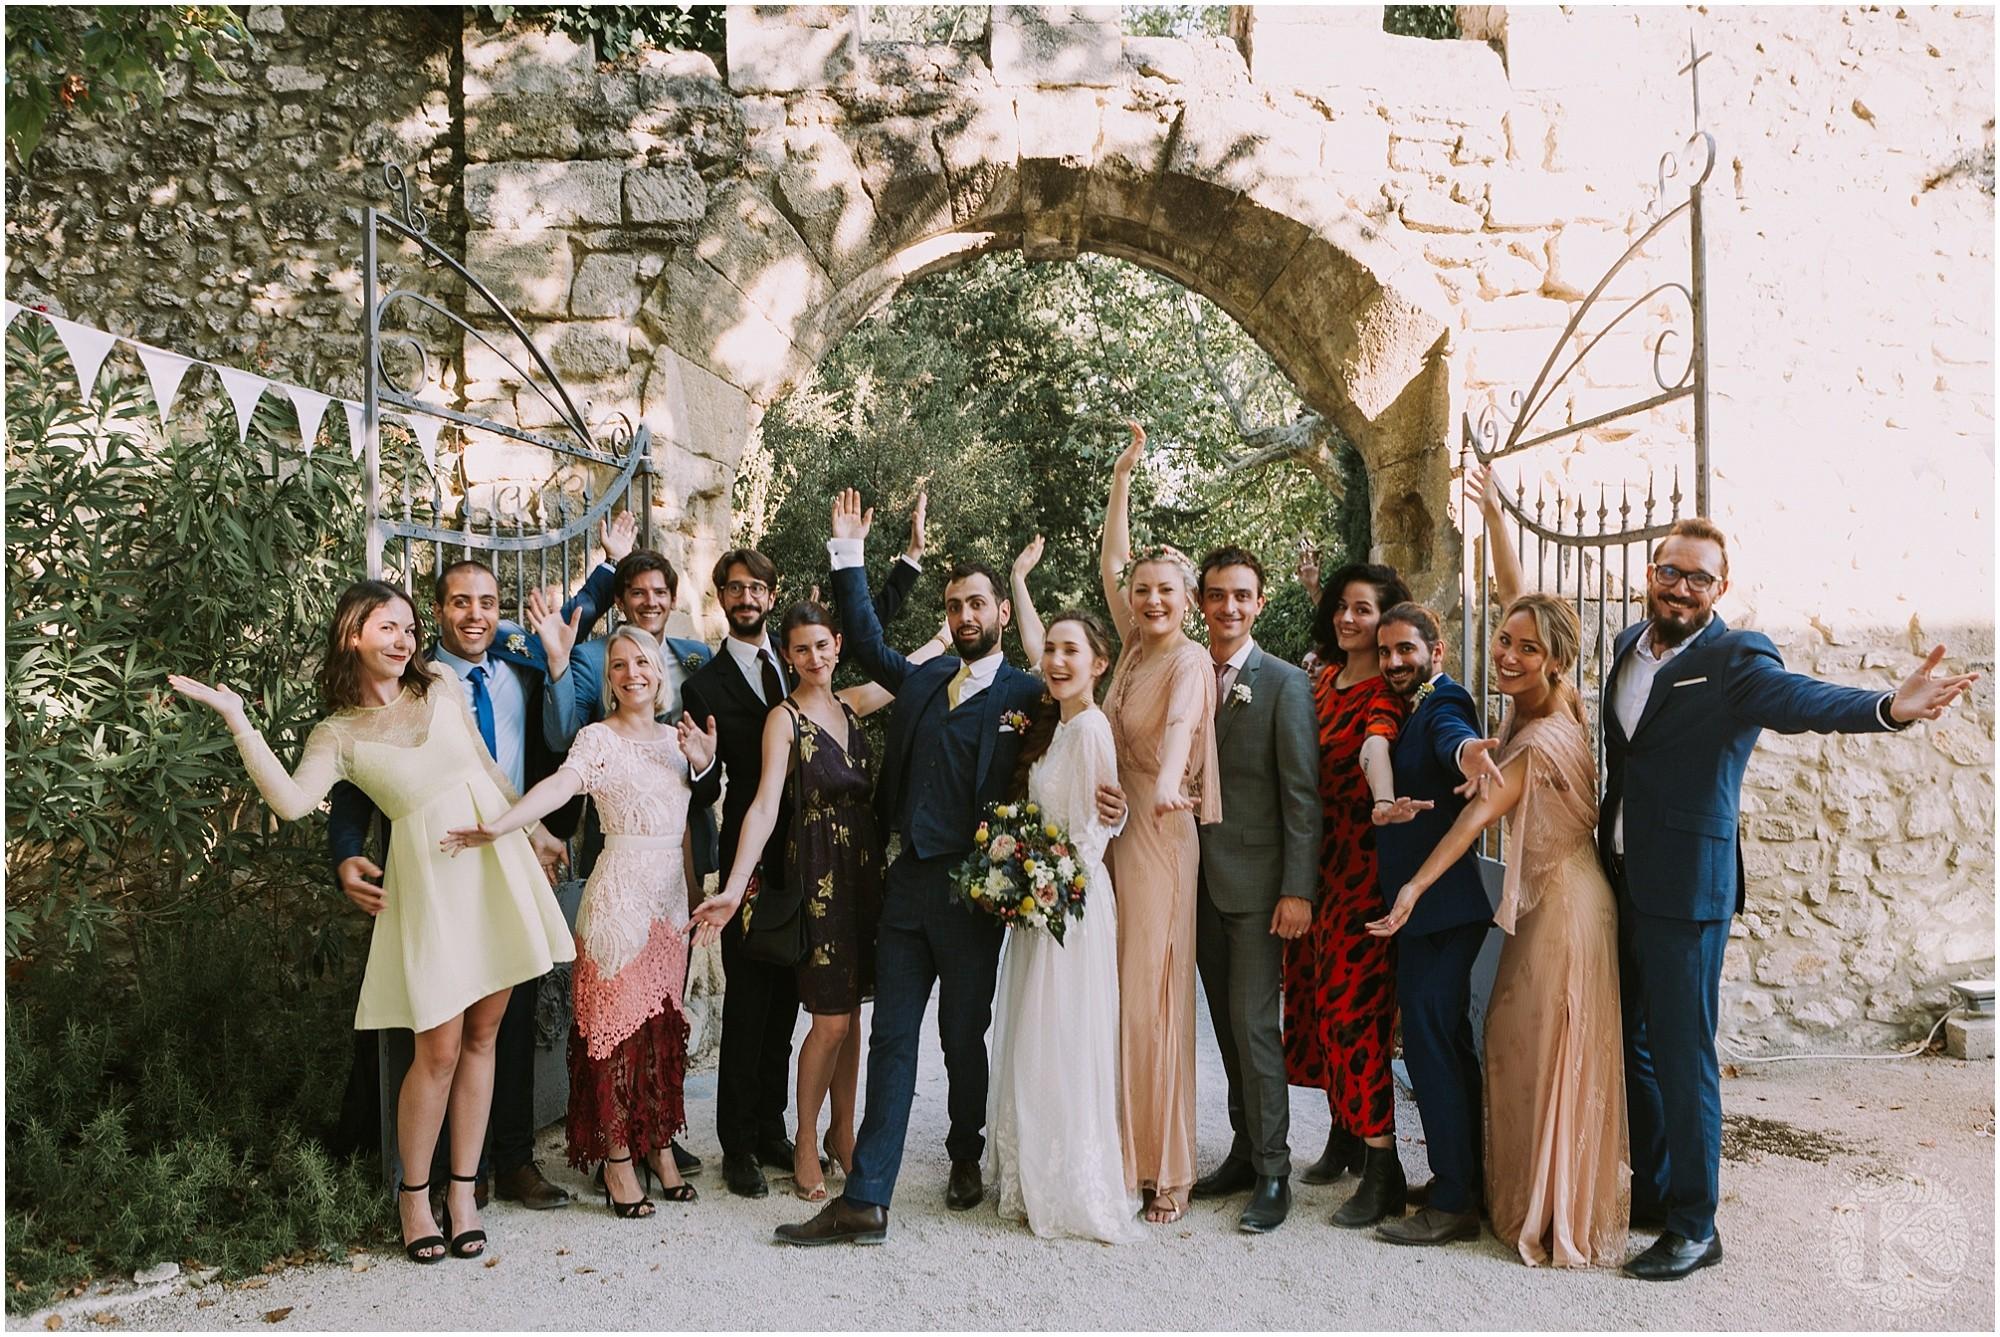 Kateryna-photos-photographe-mariage-vaucluse-provence-avignon-ferme-st-hugues_0060.jpg